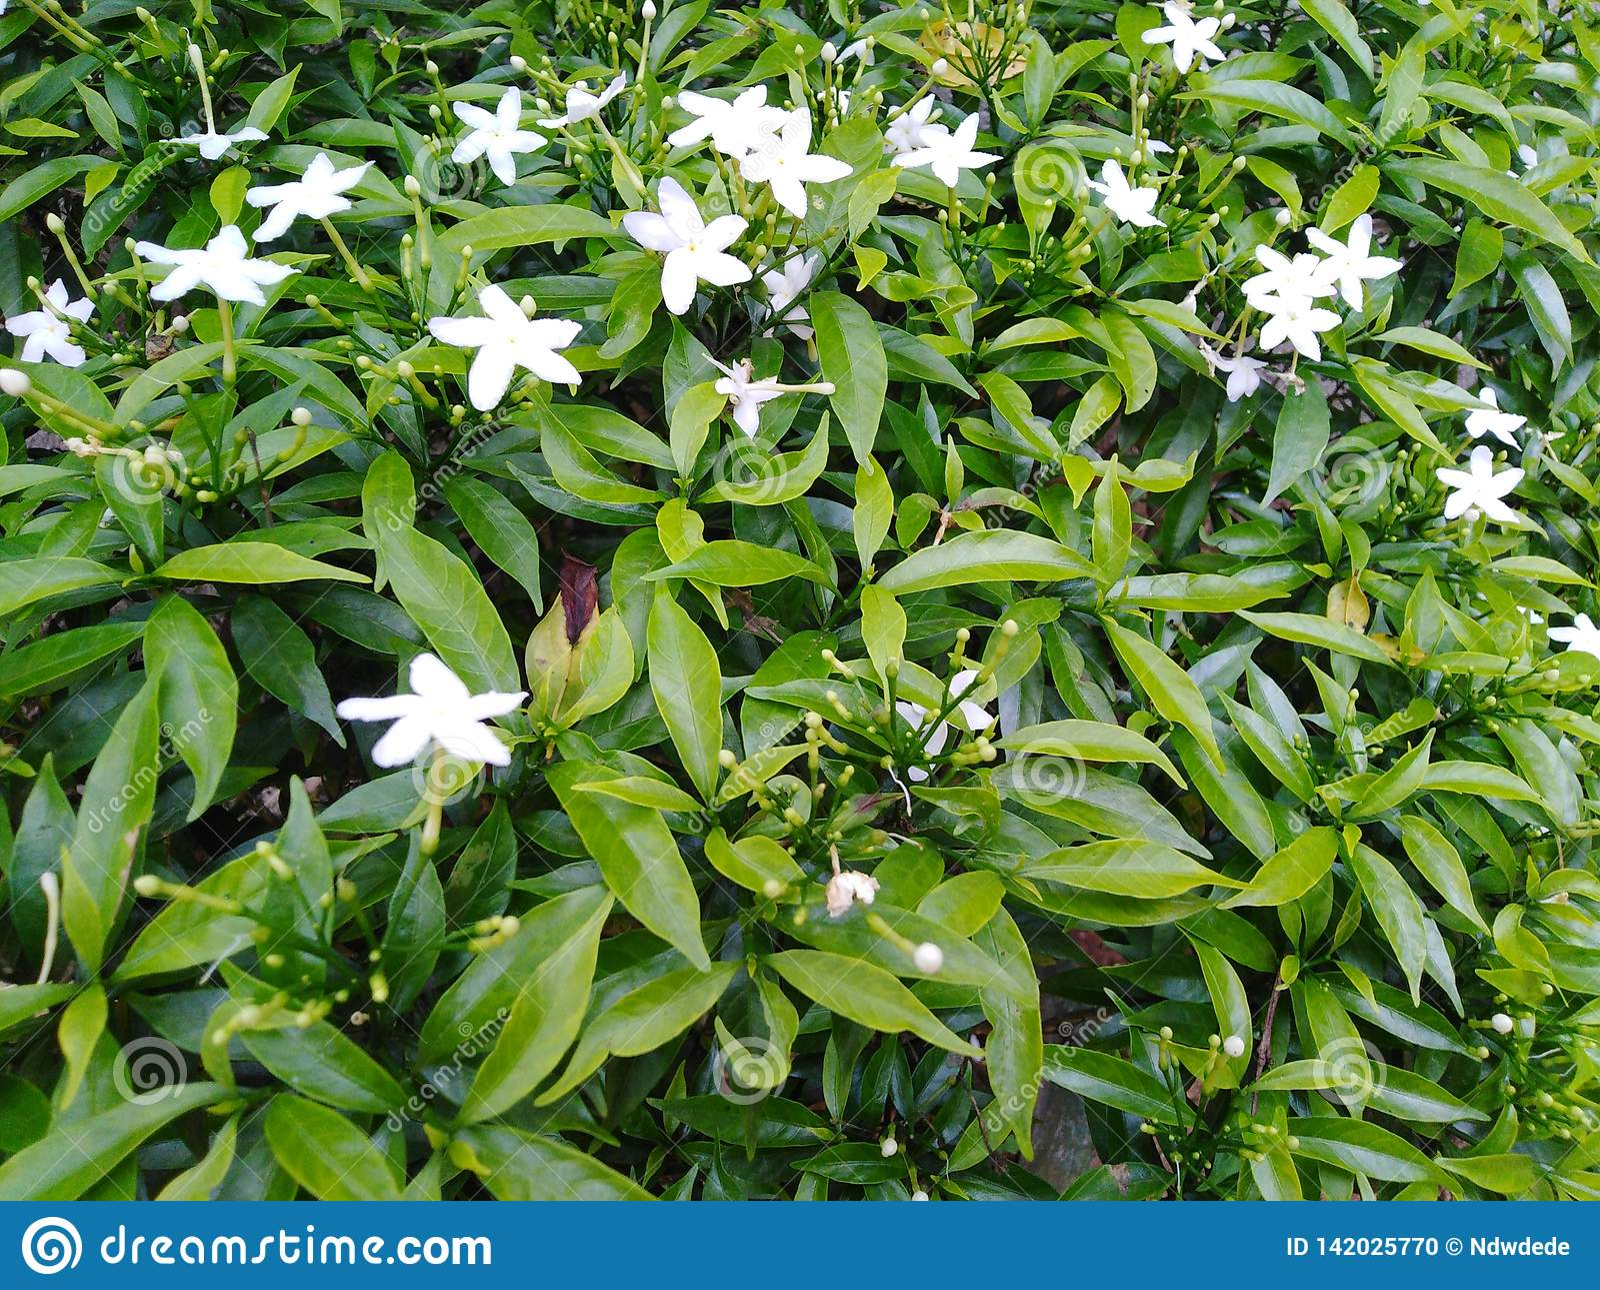 Tiny white garden flowers